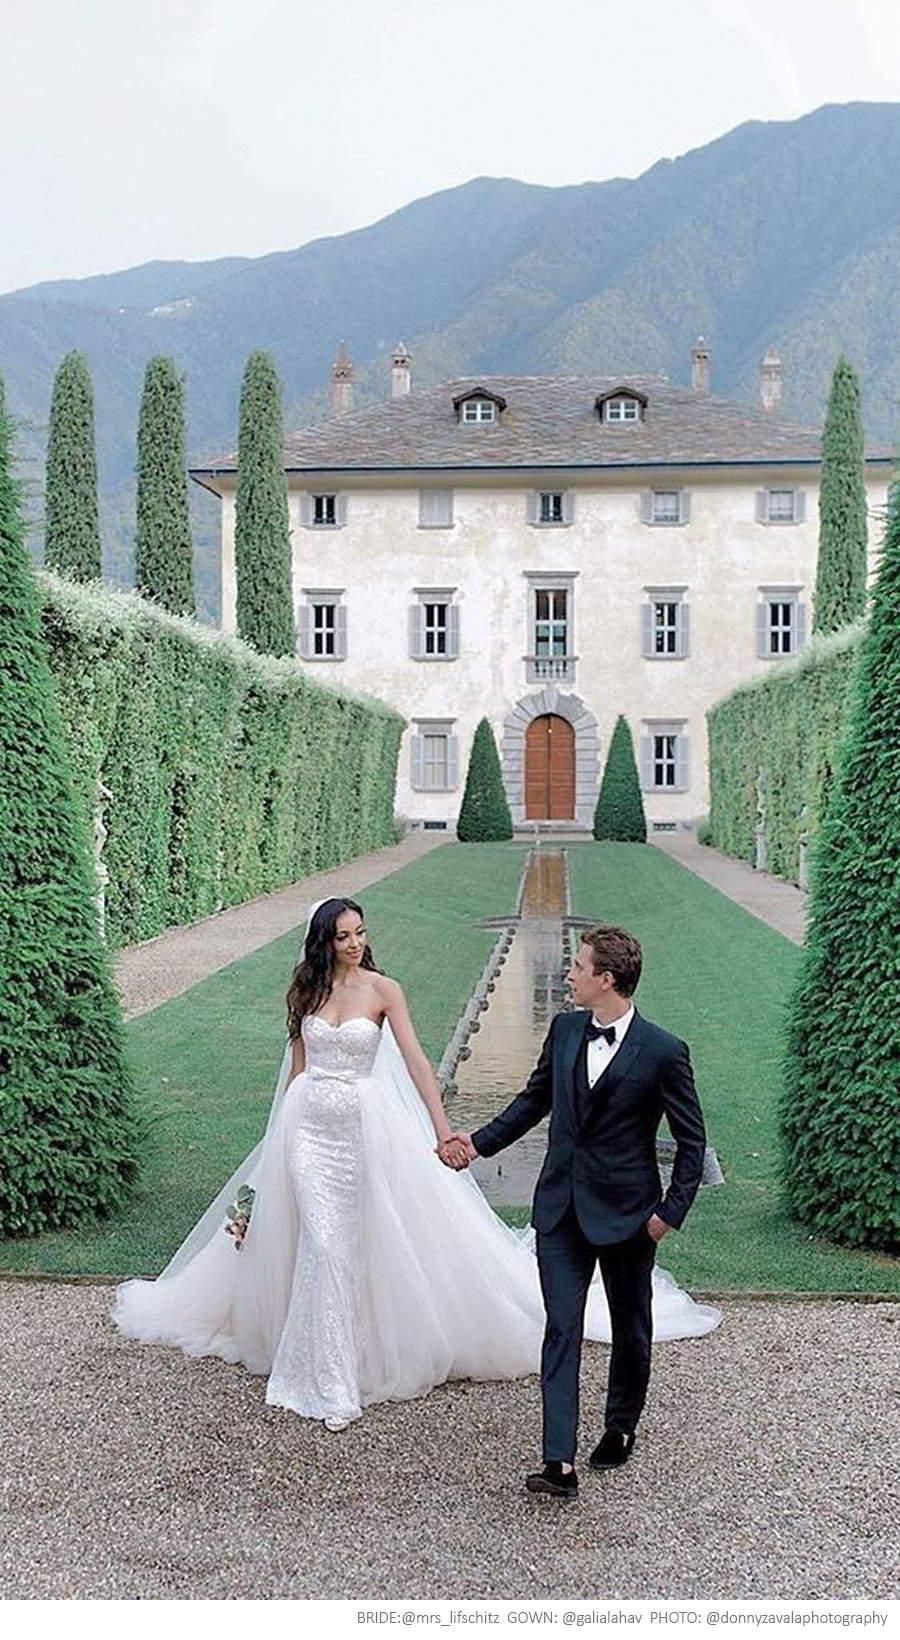 galia lahav fall 2019 bridal strapless straight across lace sheath mermaid wedding dress chapel train illusion a line overskirt pockets gloves (alba) mrs lifschitz photo donnyzavalaphotography